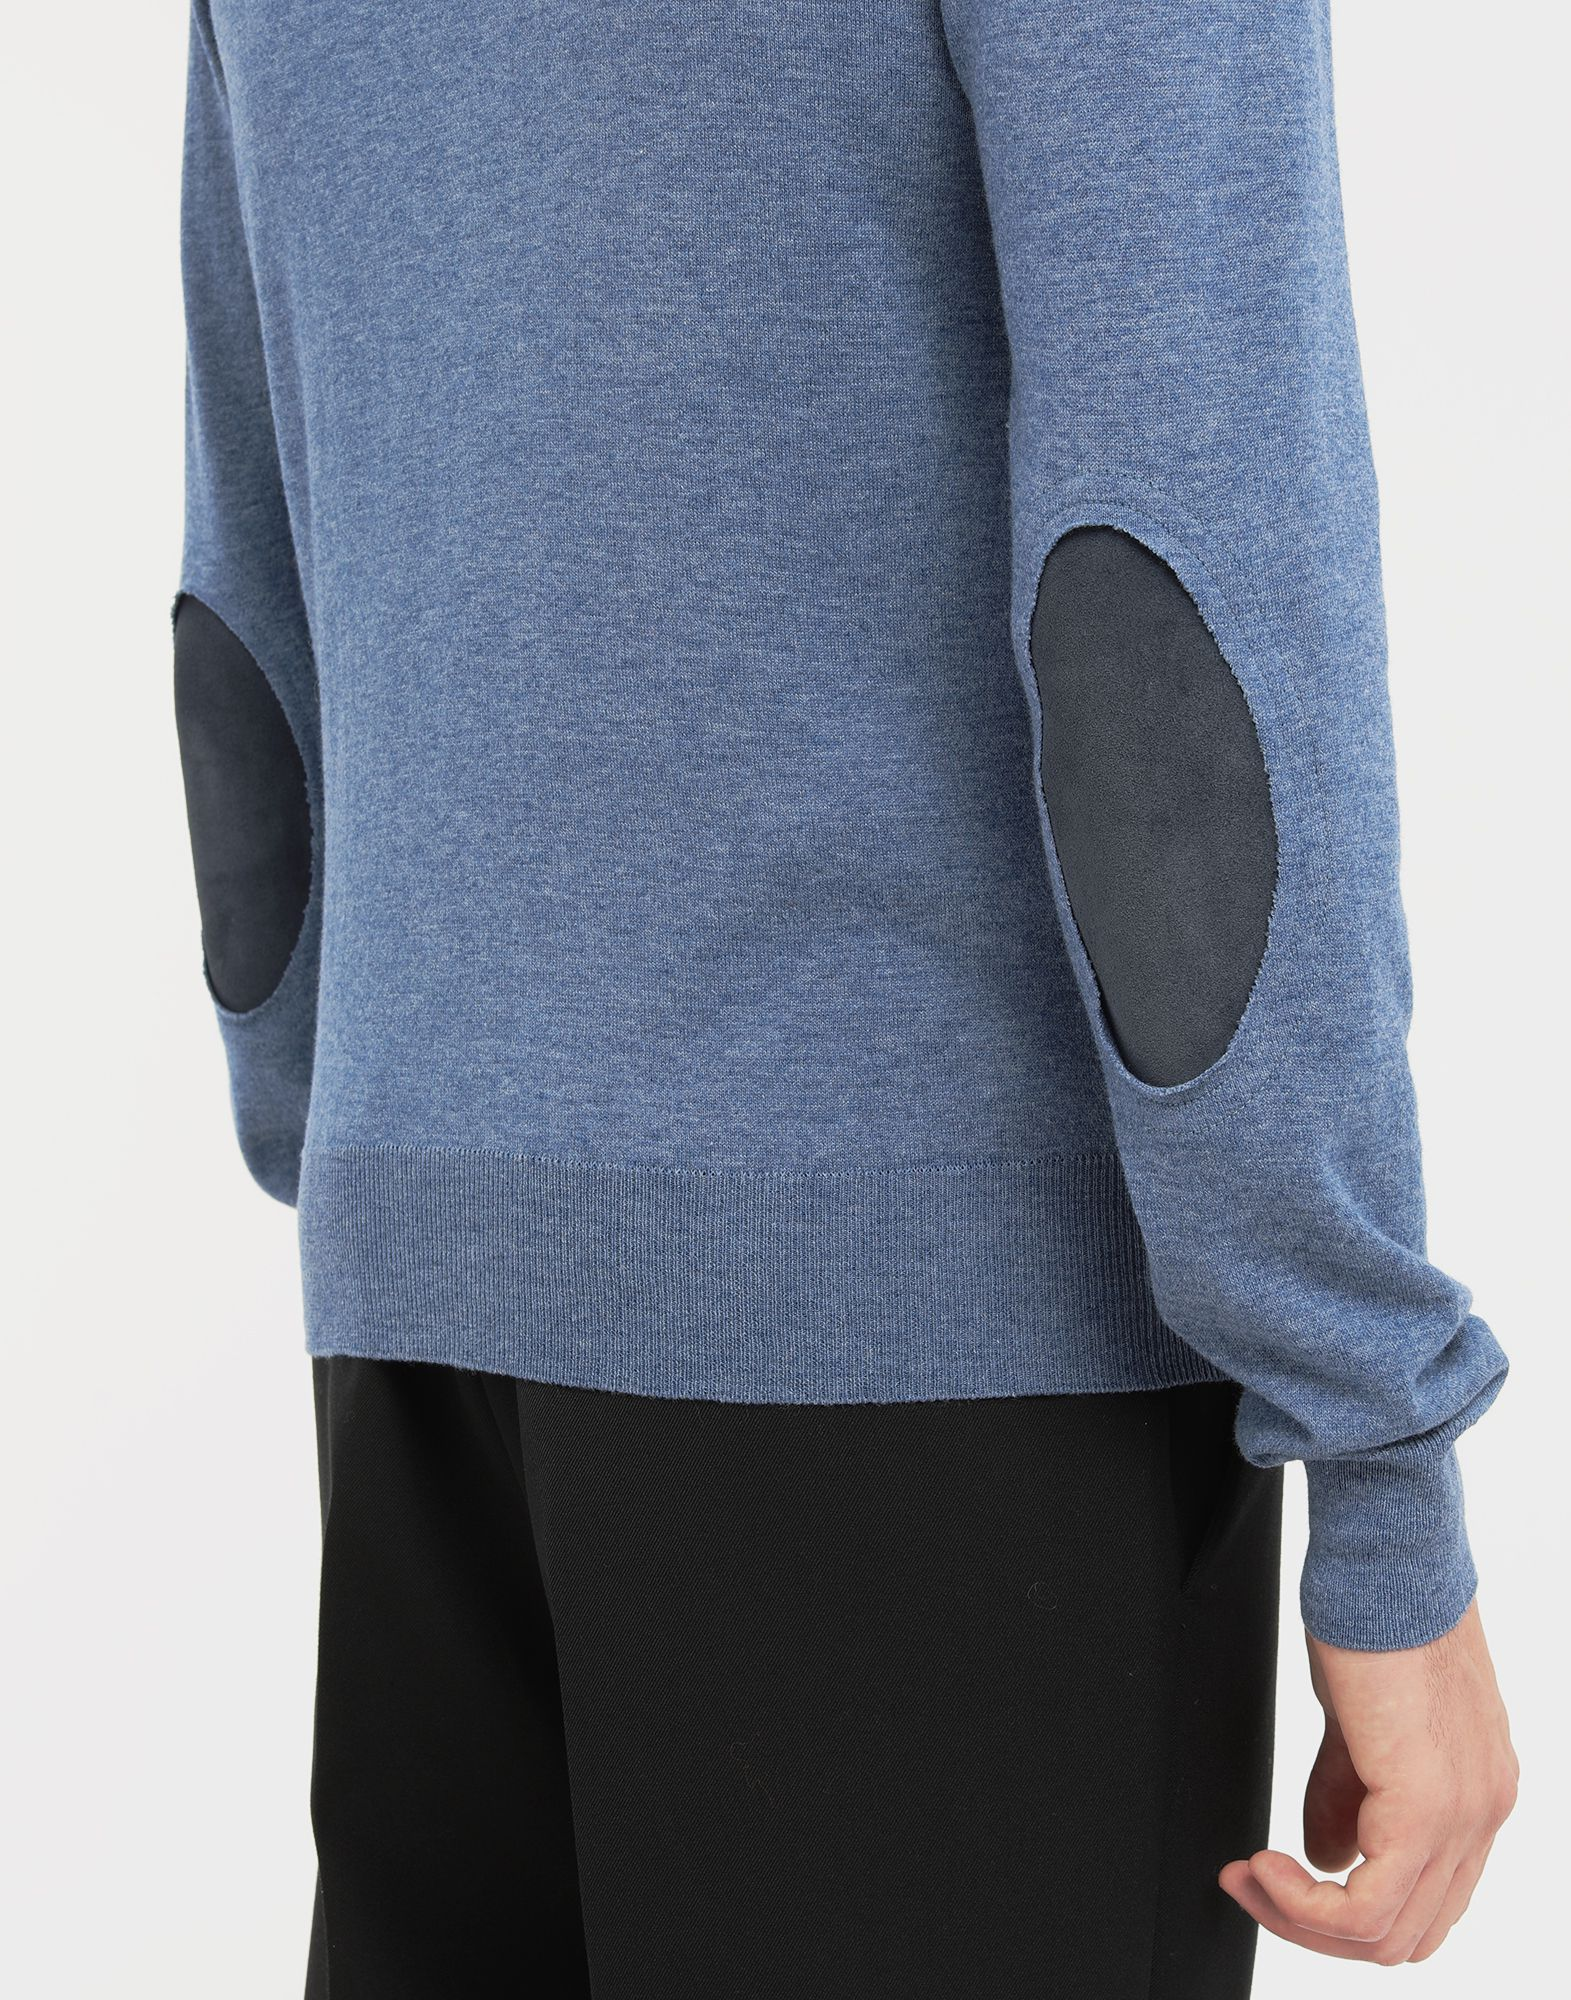 MAISON MARGIELA Décortiqué elbow patch knit pullover Long sleeve sweater Man b